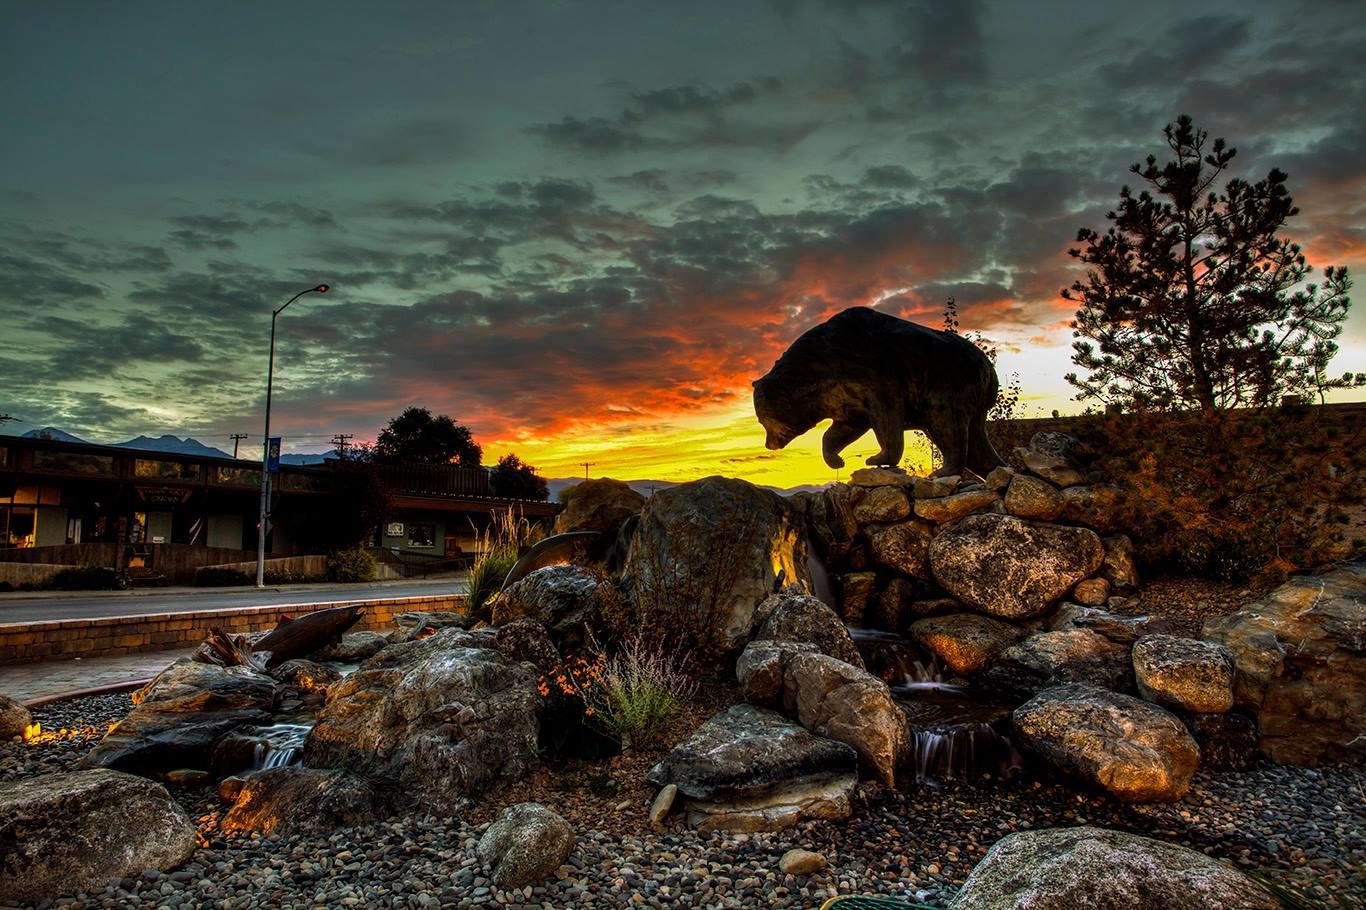 The Bear in Bronze by Robert Deurloo